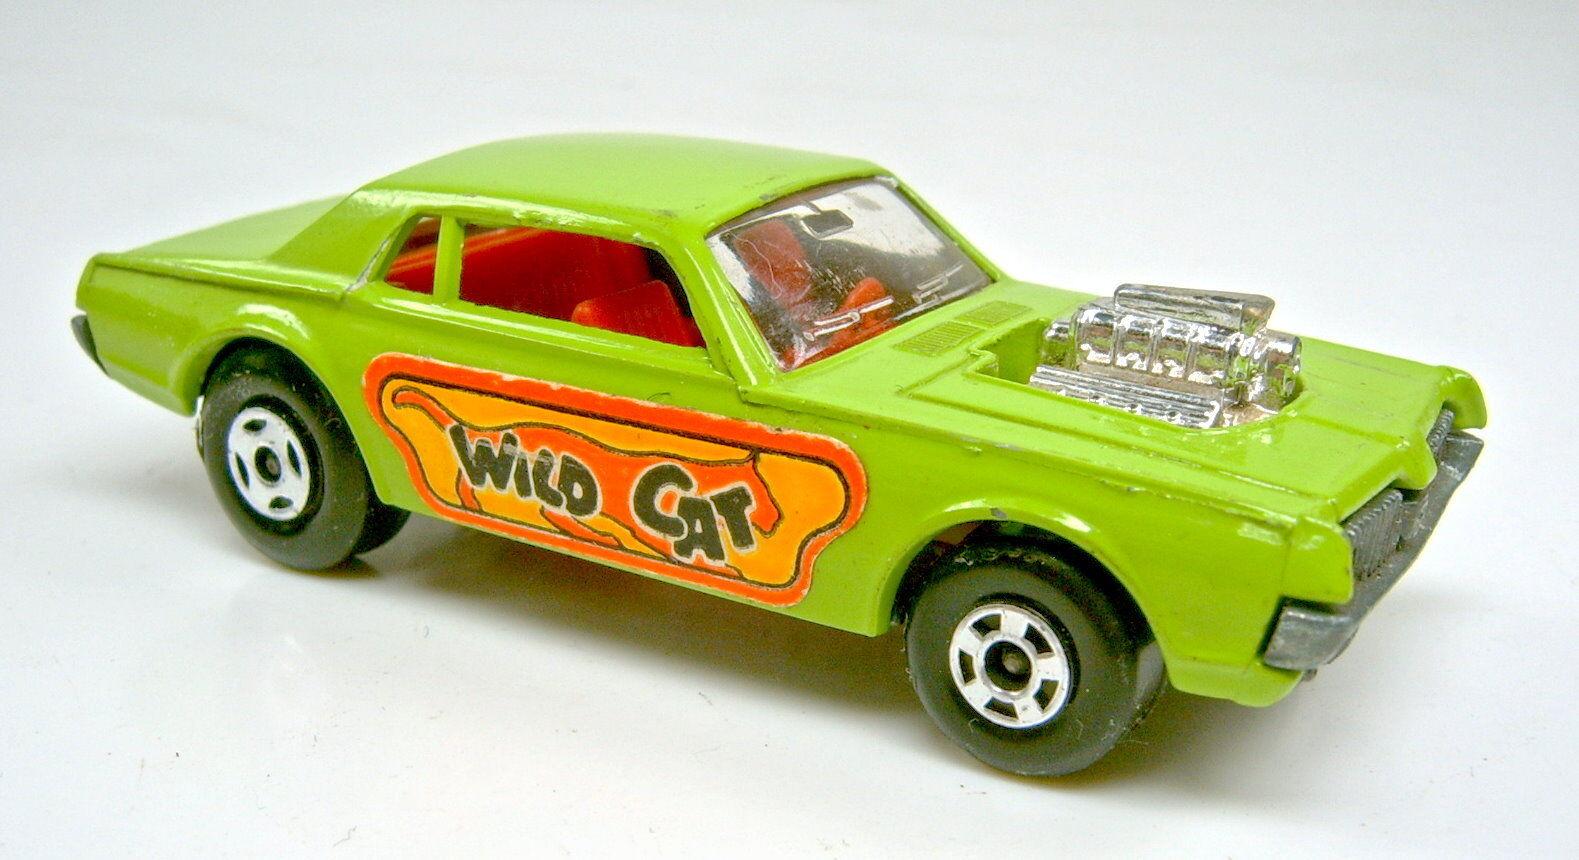 MATCHBOX SUPERFAST n. 62b Consiglio Rod DRAGSTER GIALLO verde  WILD CAT  ADESIVO